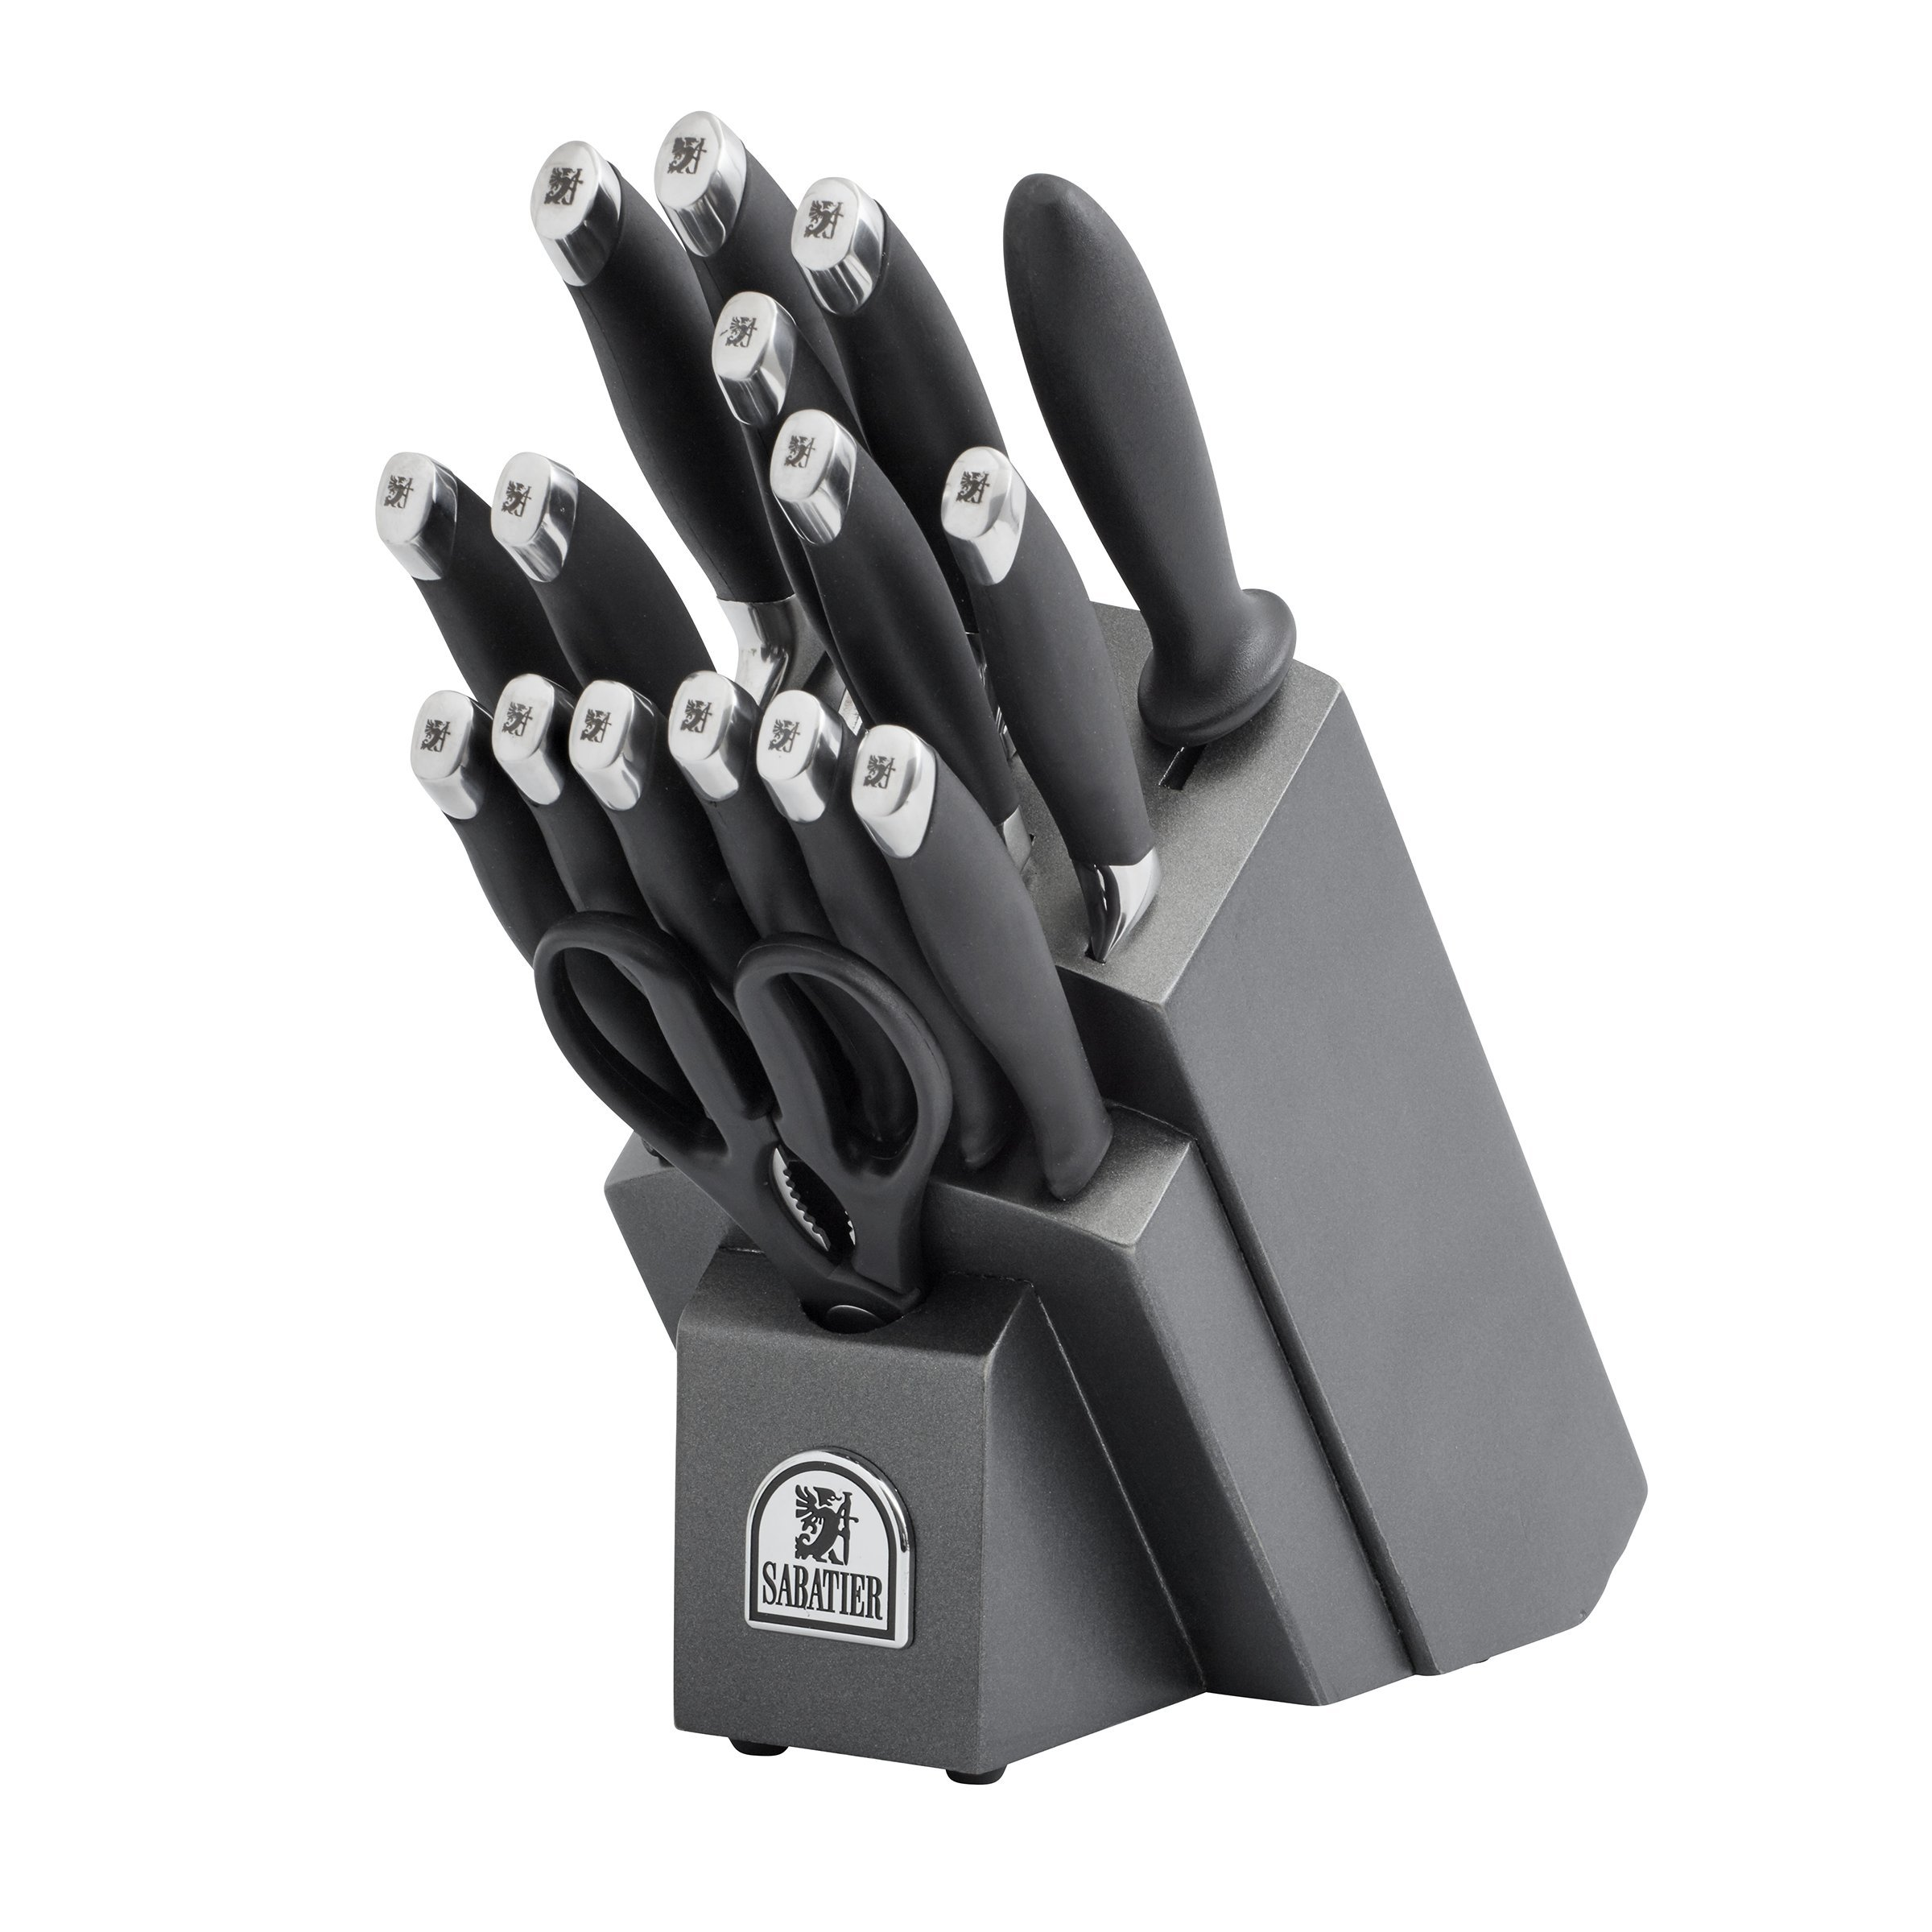 Sabatier 17-Piece Soft Grip Forged Stainless Steel Knife Block Set